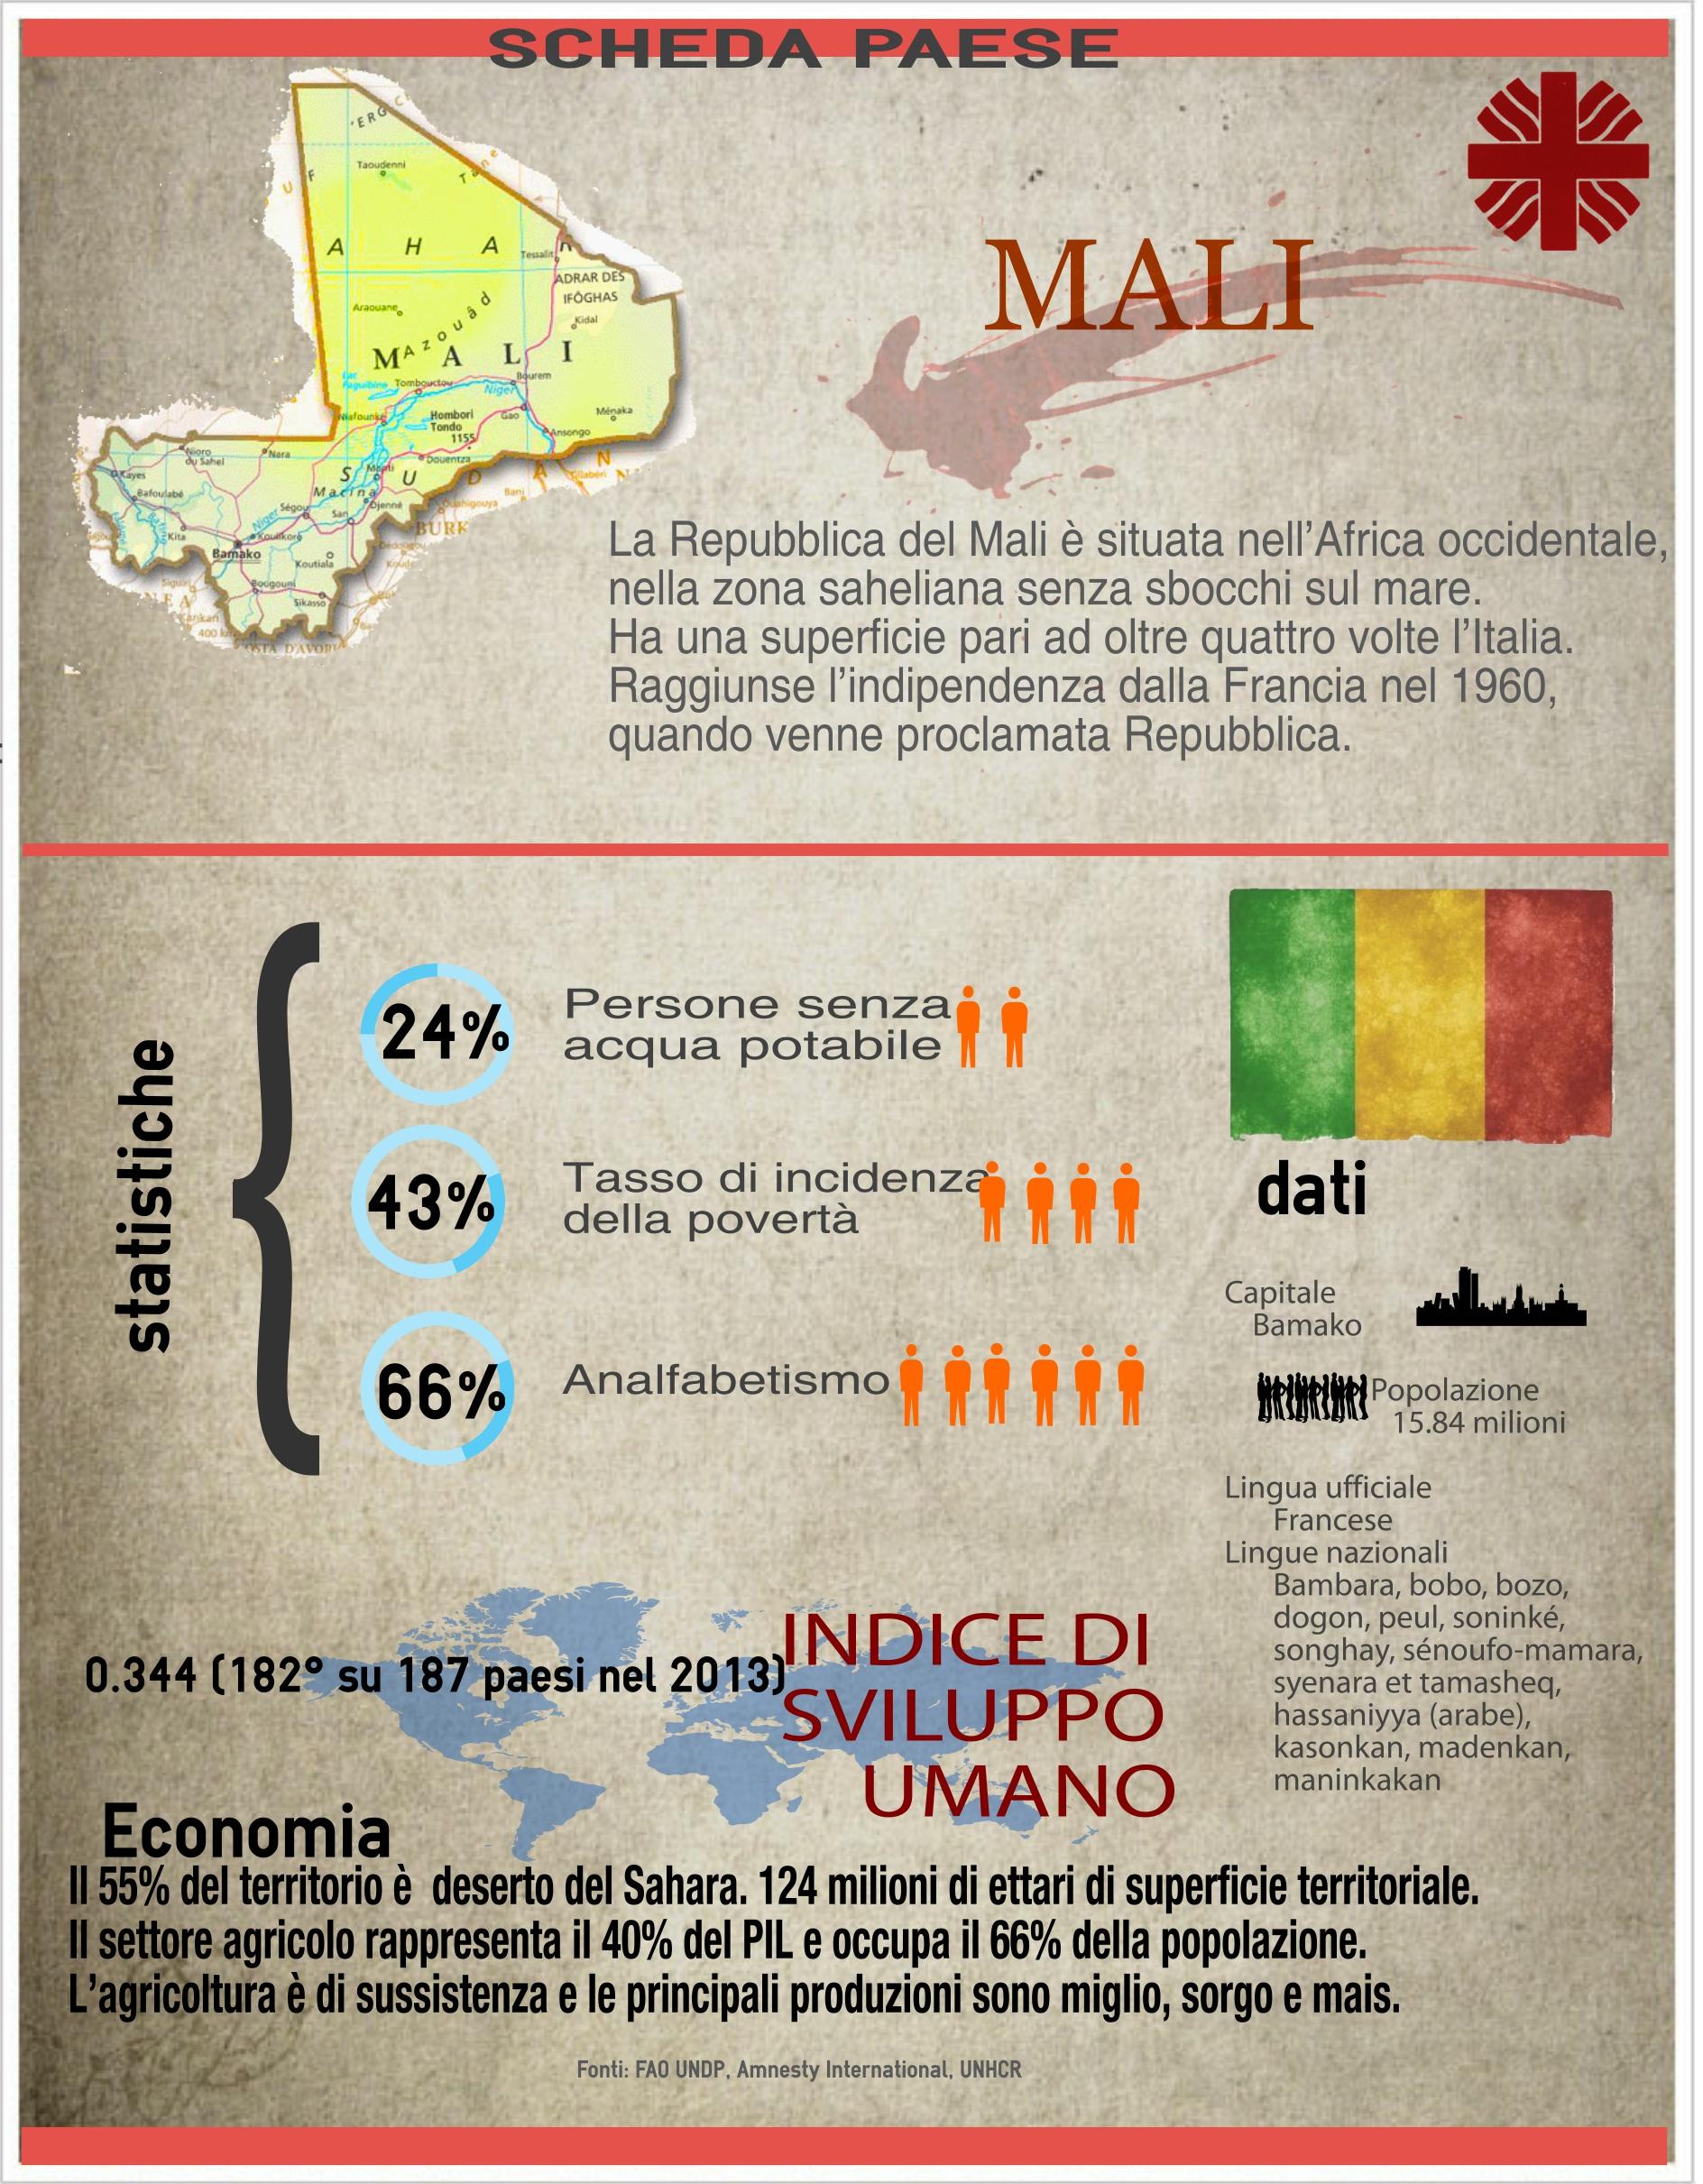 Scheda Paese Mali